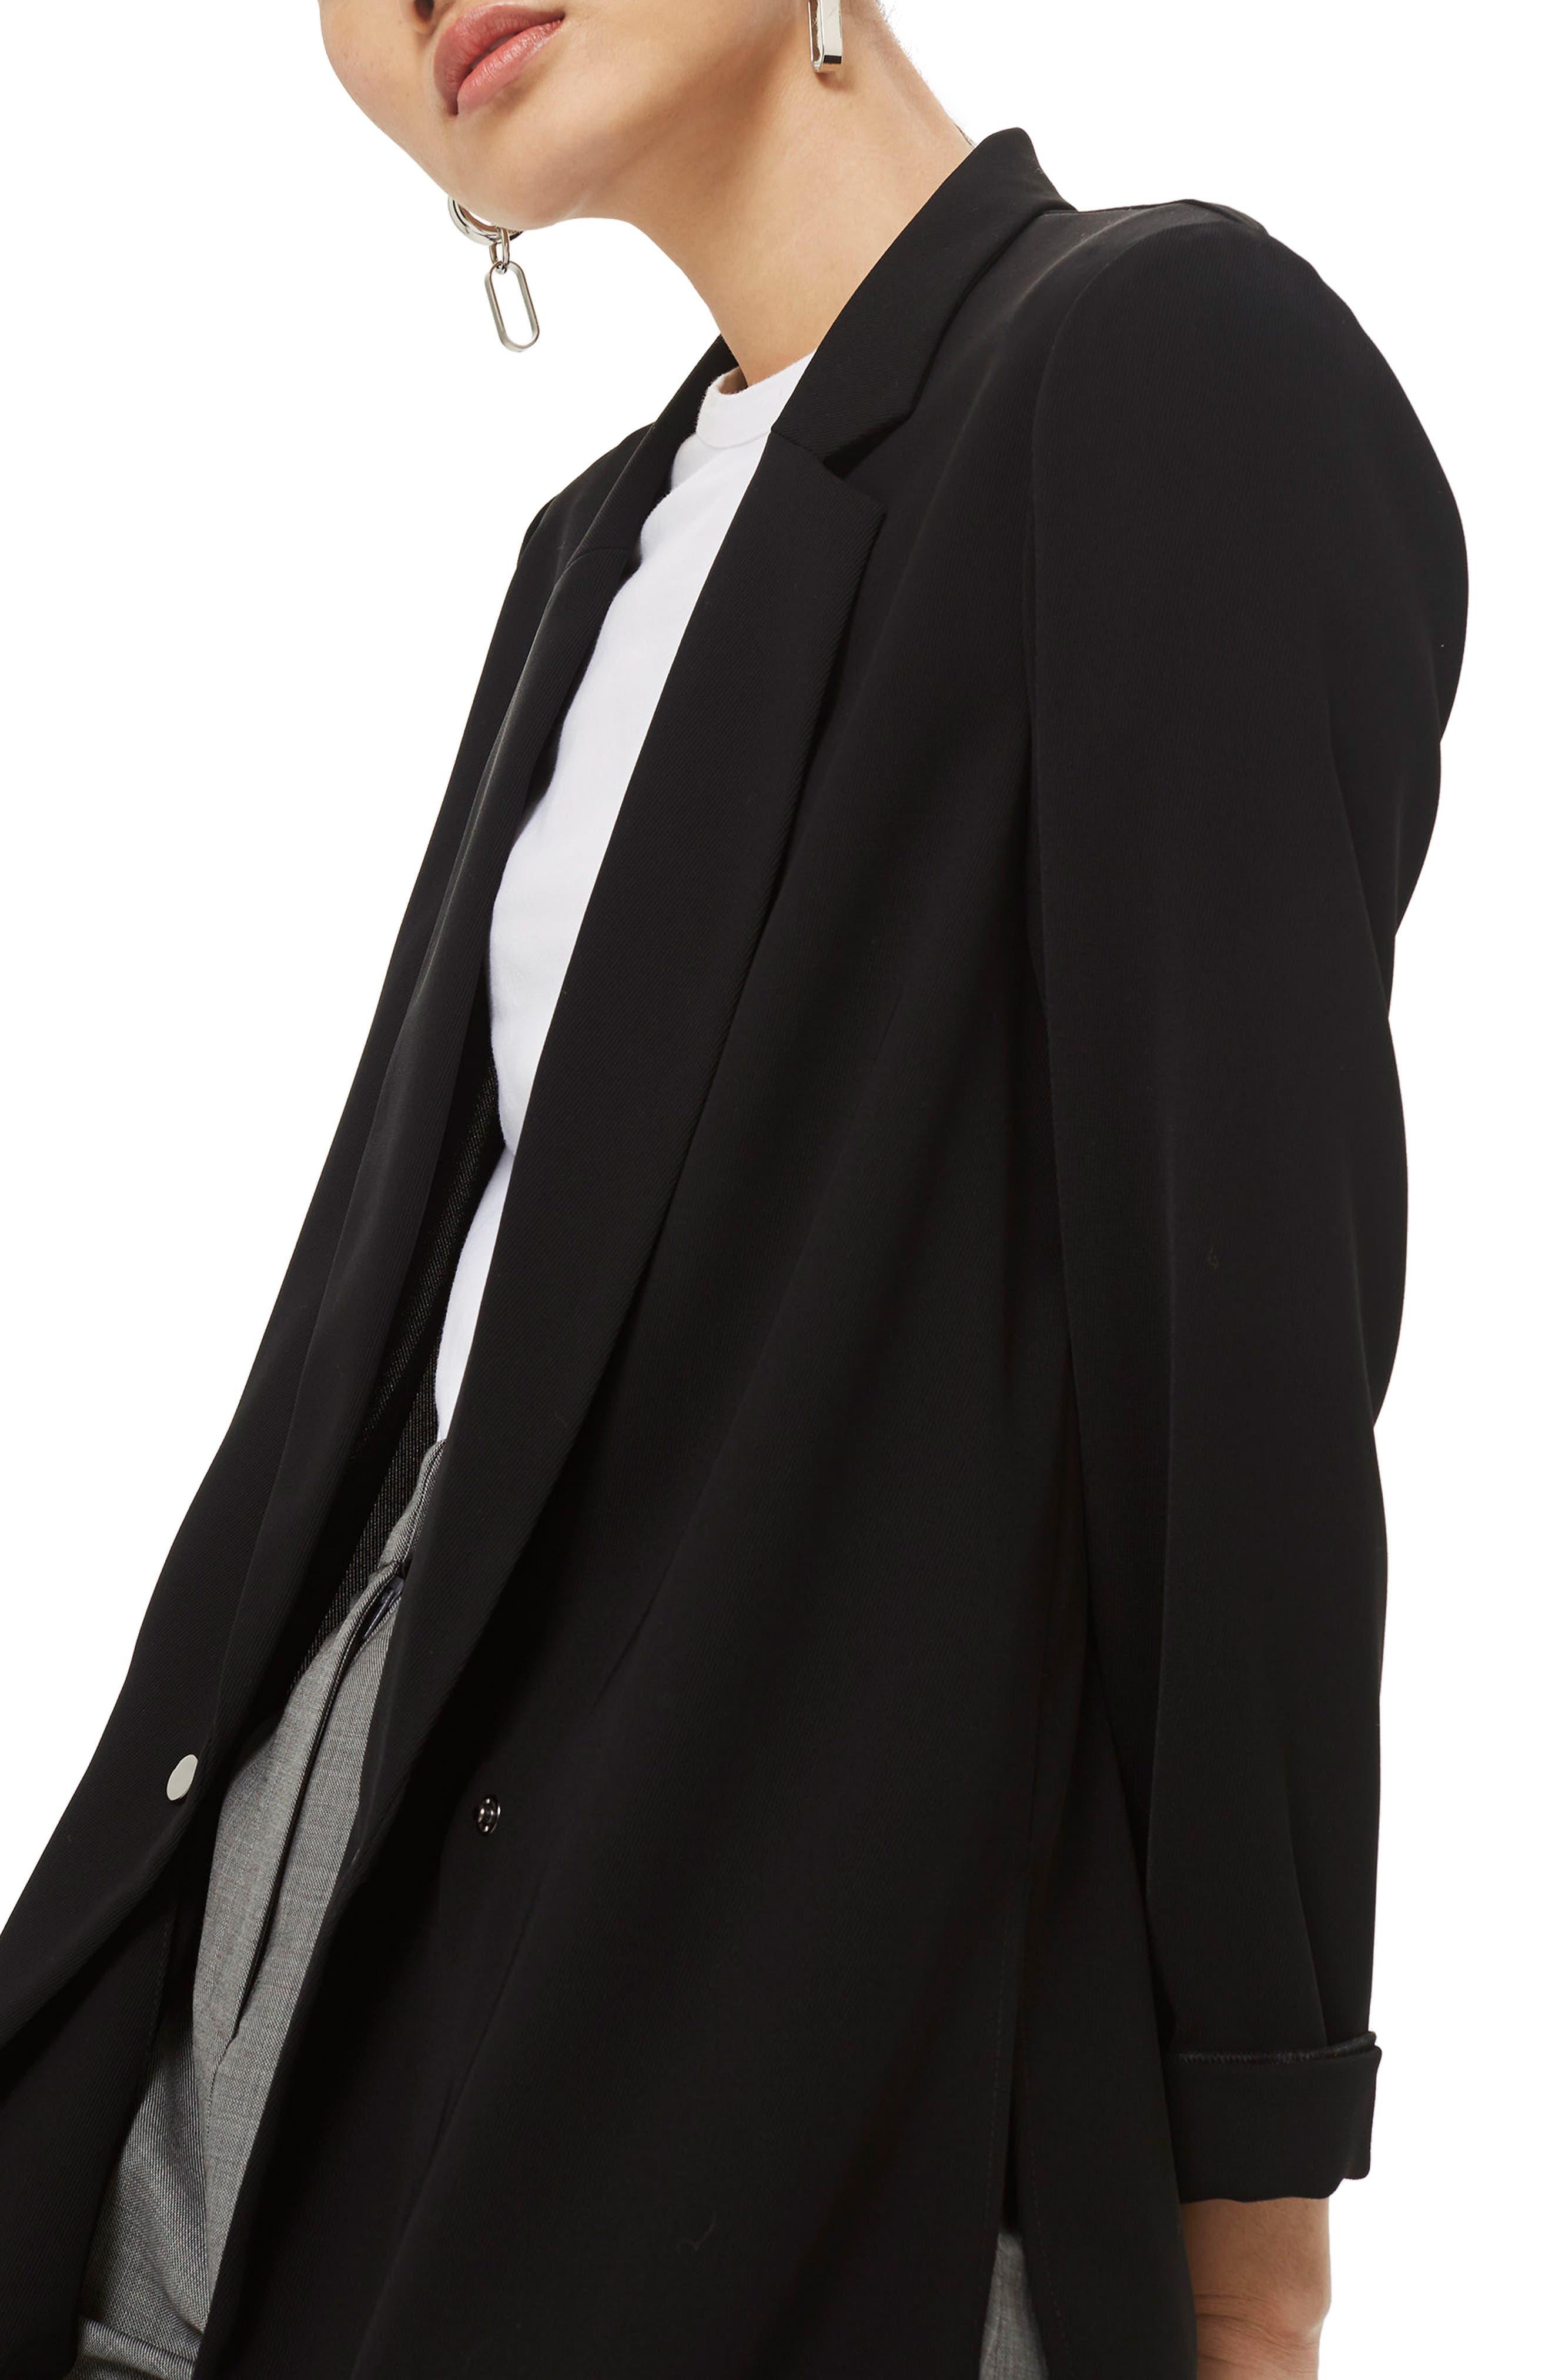 Ava Double Breasted Jacket,                             Main thumbnail 1, color,                             BLACK